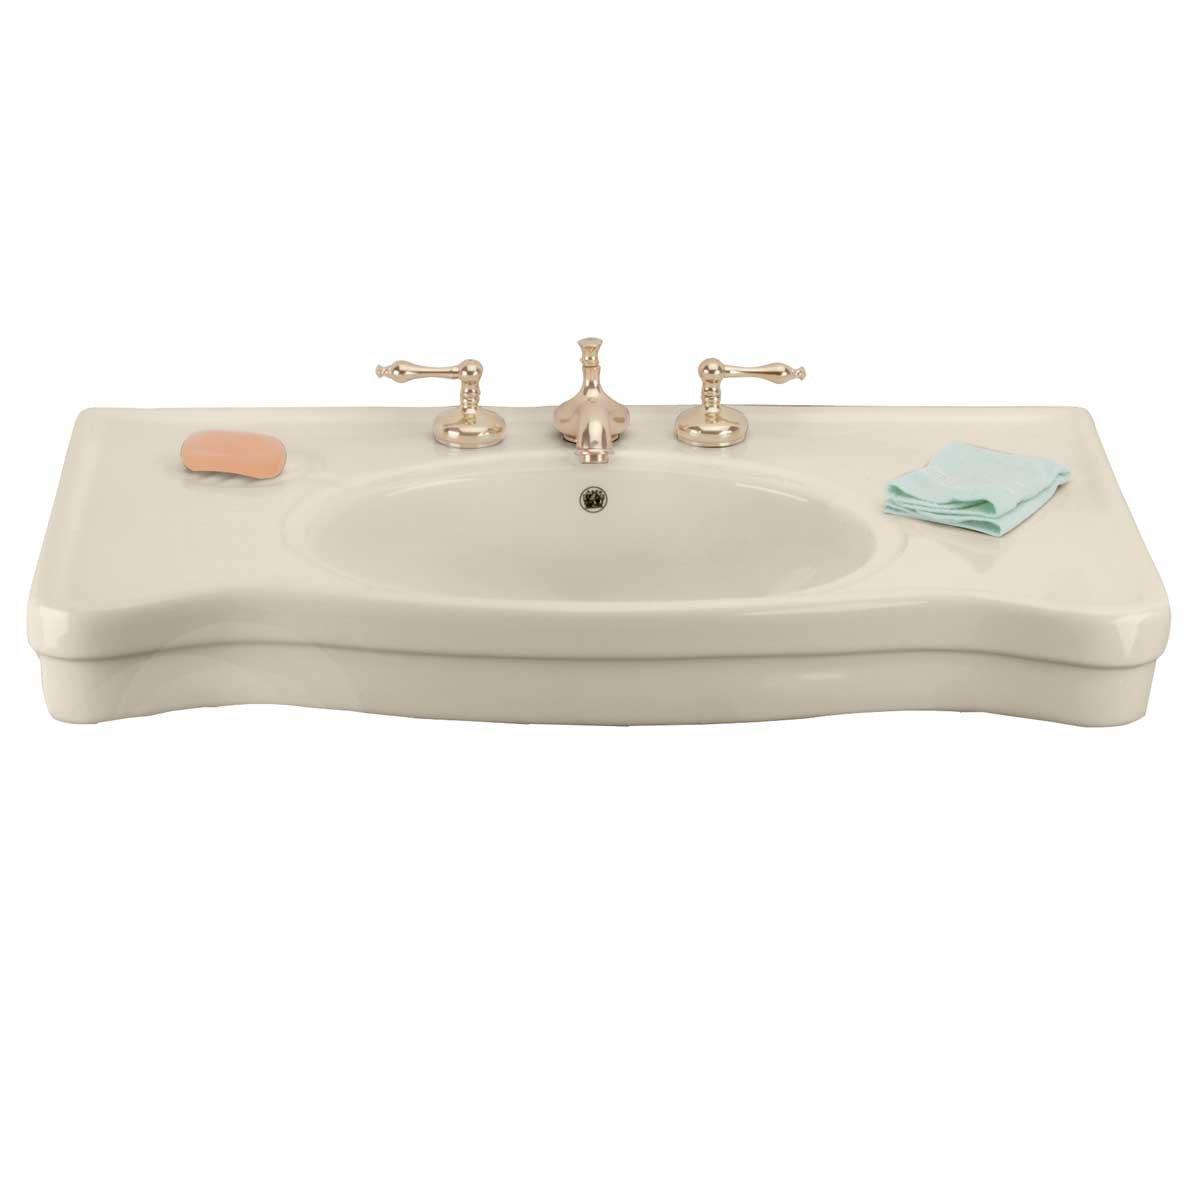 ''Belle Epoque'' Bone China Console Sink 8'' Centerset Faucet Hole European Luxury Style